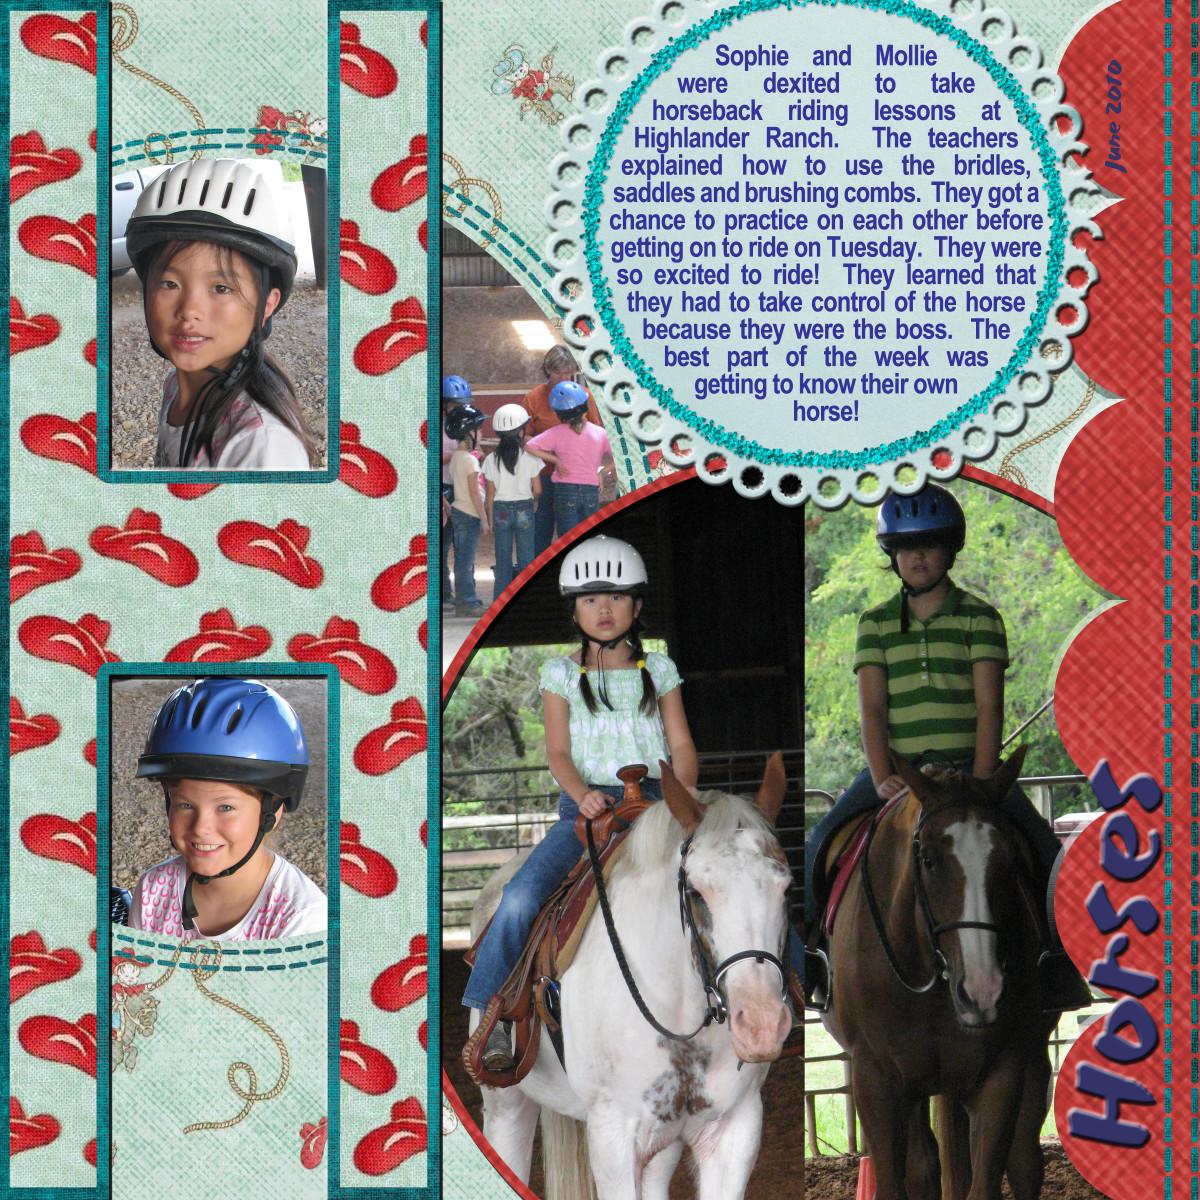 Learning horseback riding together.